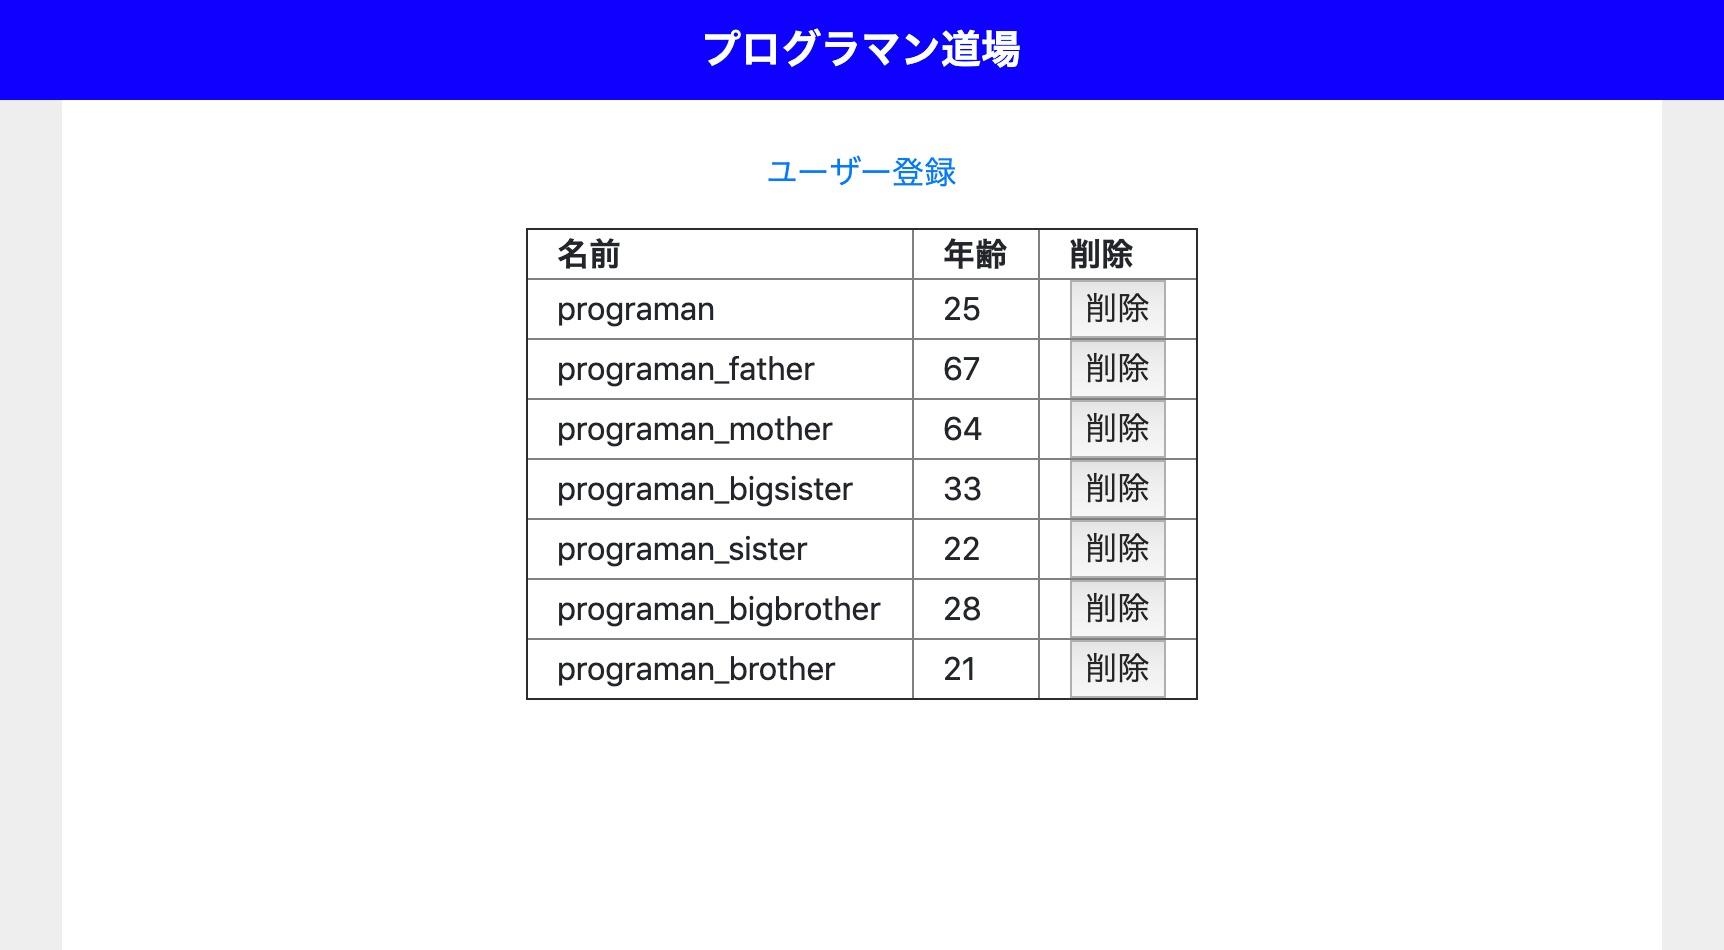 no_sidebar.html.erbがレイアウトファイル